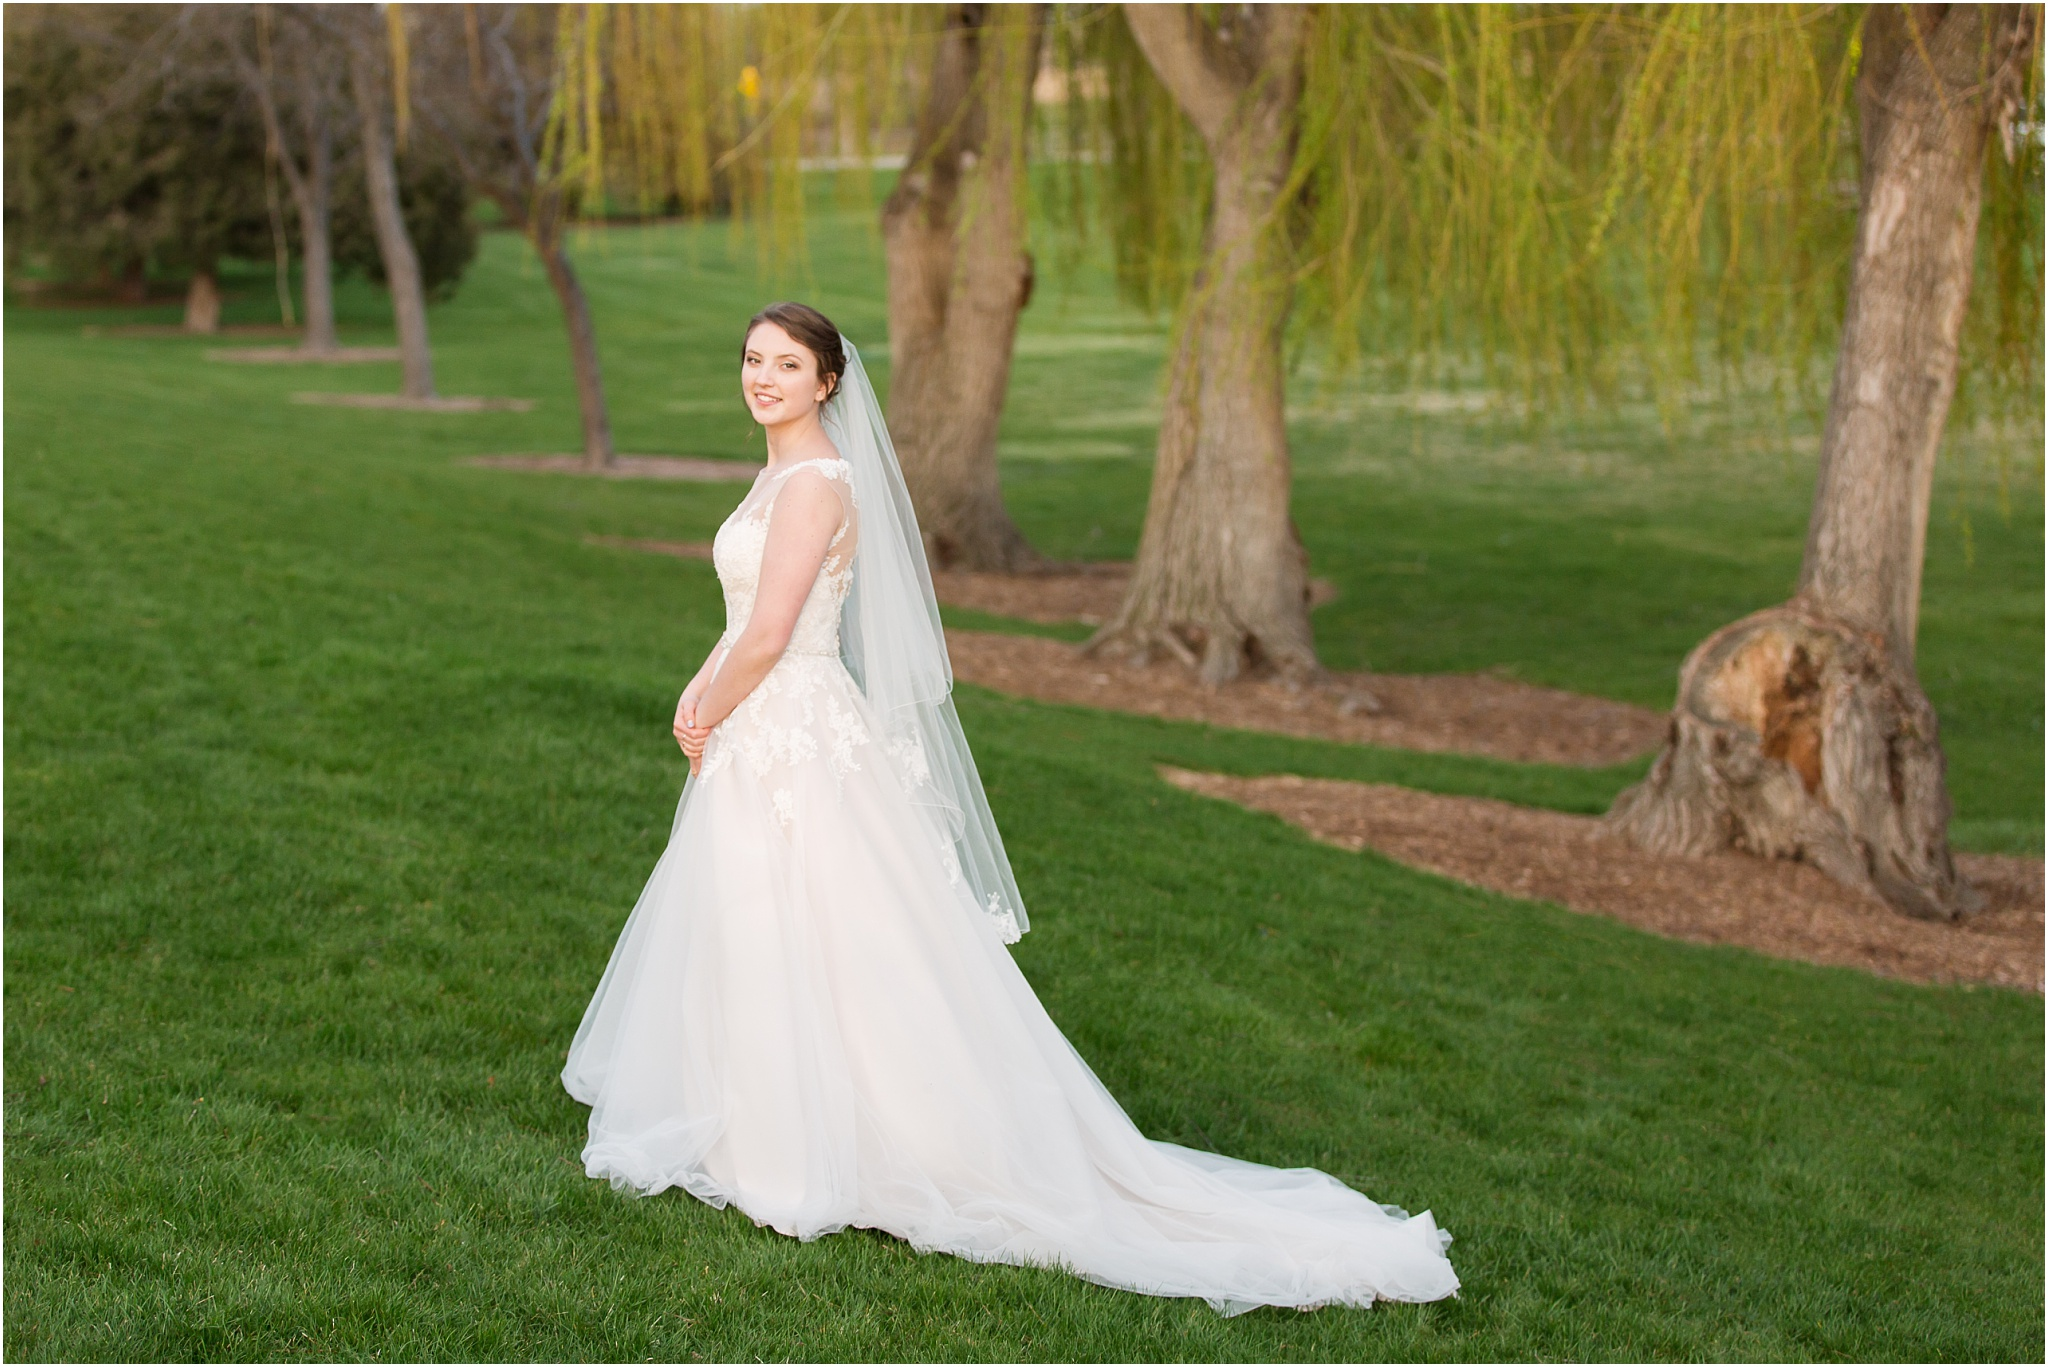 Wedding Photography_Meridian Idaho_Nampa Idaho_Leah Southwick Photography_0077.jpg